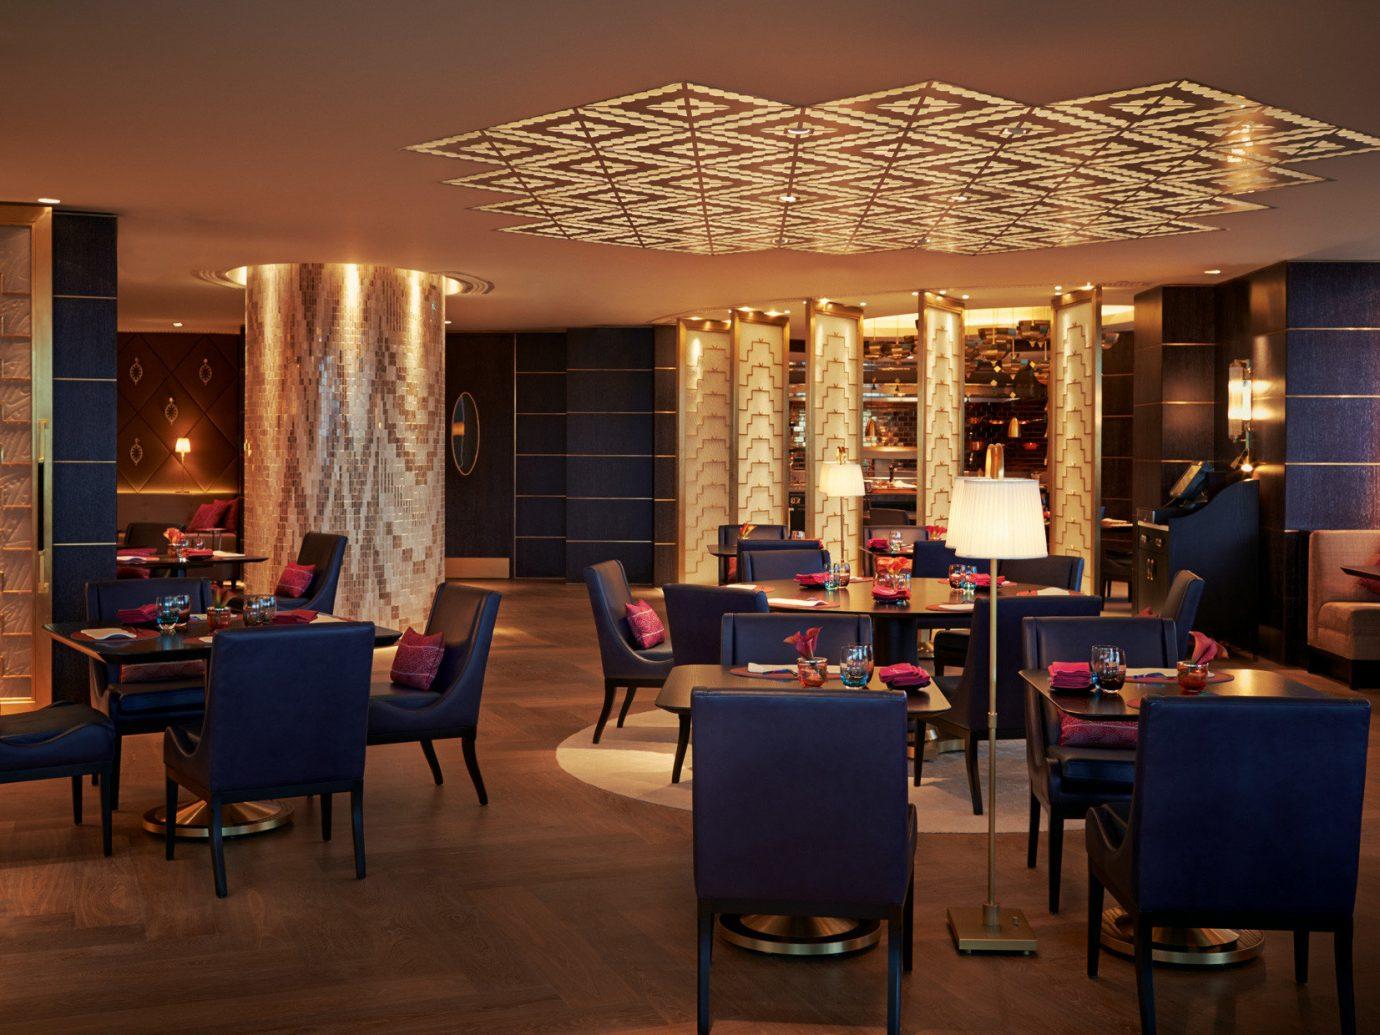 Bar Boutique Hotels Dining Drink Eat Hip Hotels Luxury Luxury Travel indoor floor room Living chair ceiling restaurant dining room interior design furniture Design estate area